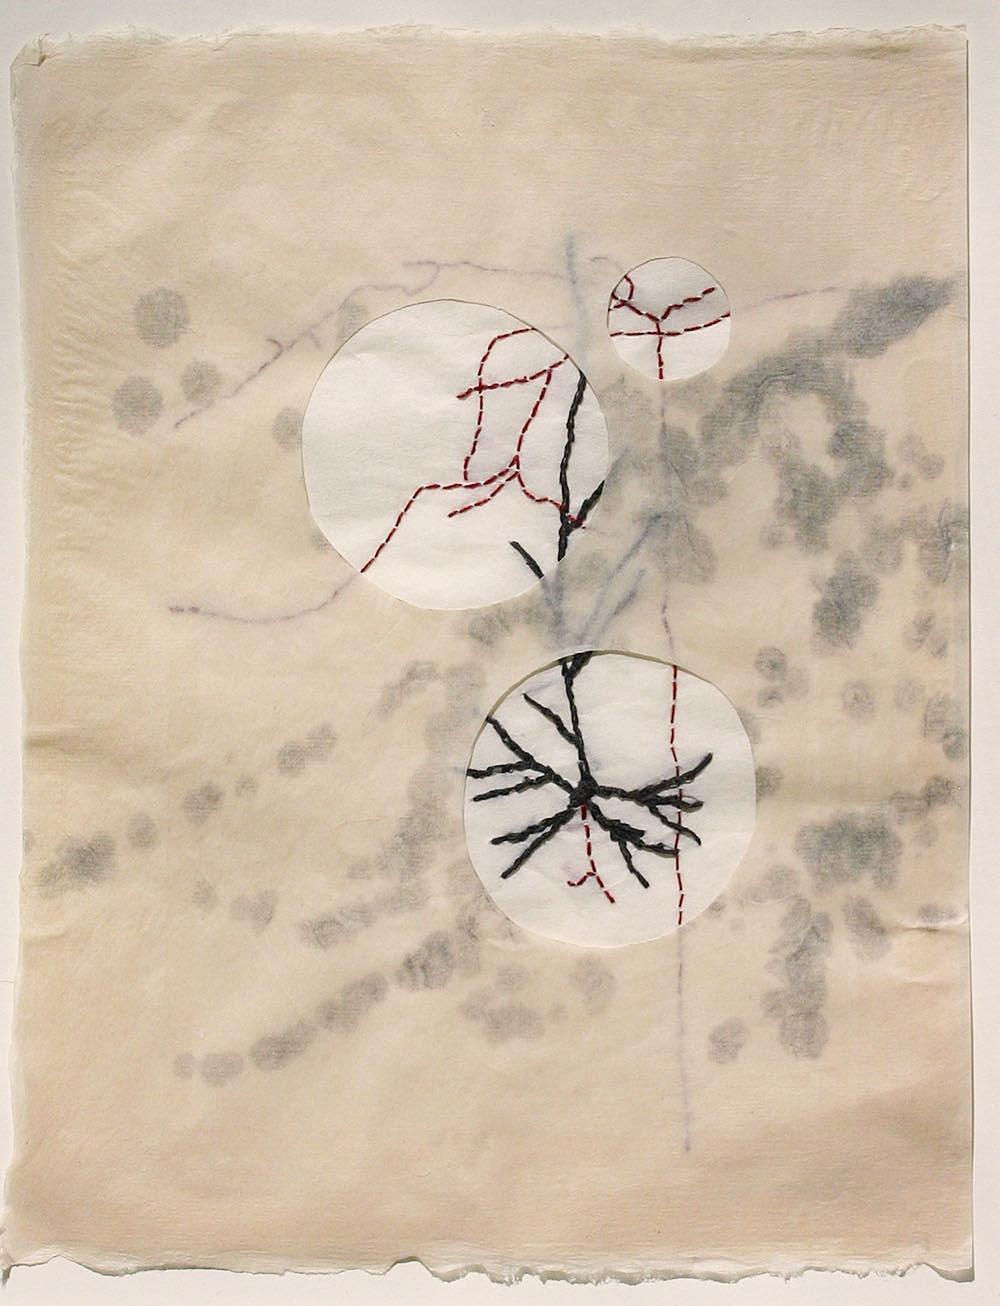 neurontest6.jpg